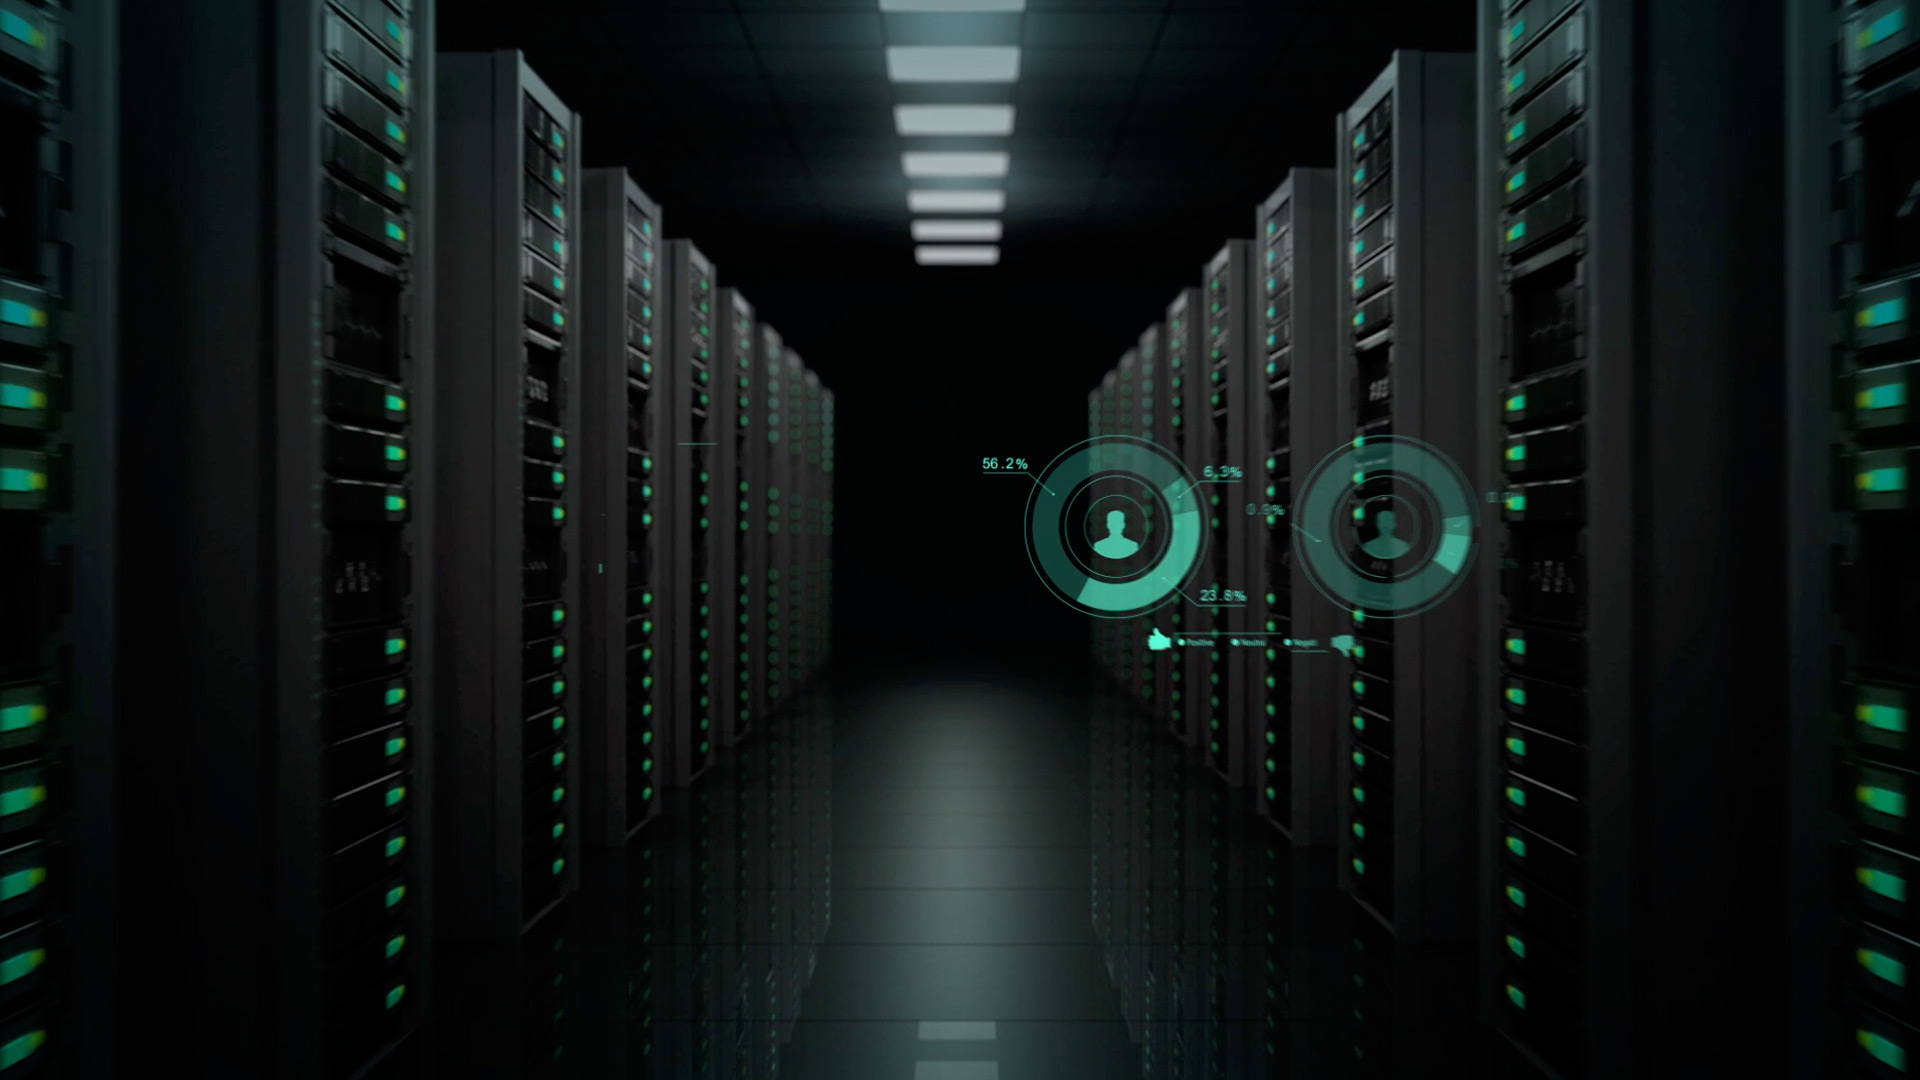 Cisco_Firepower2100_servers